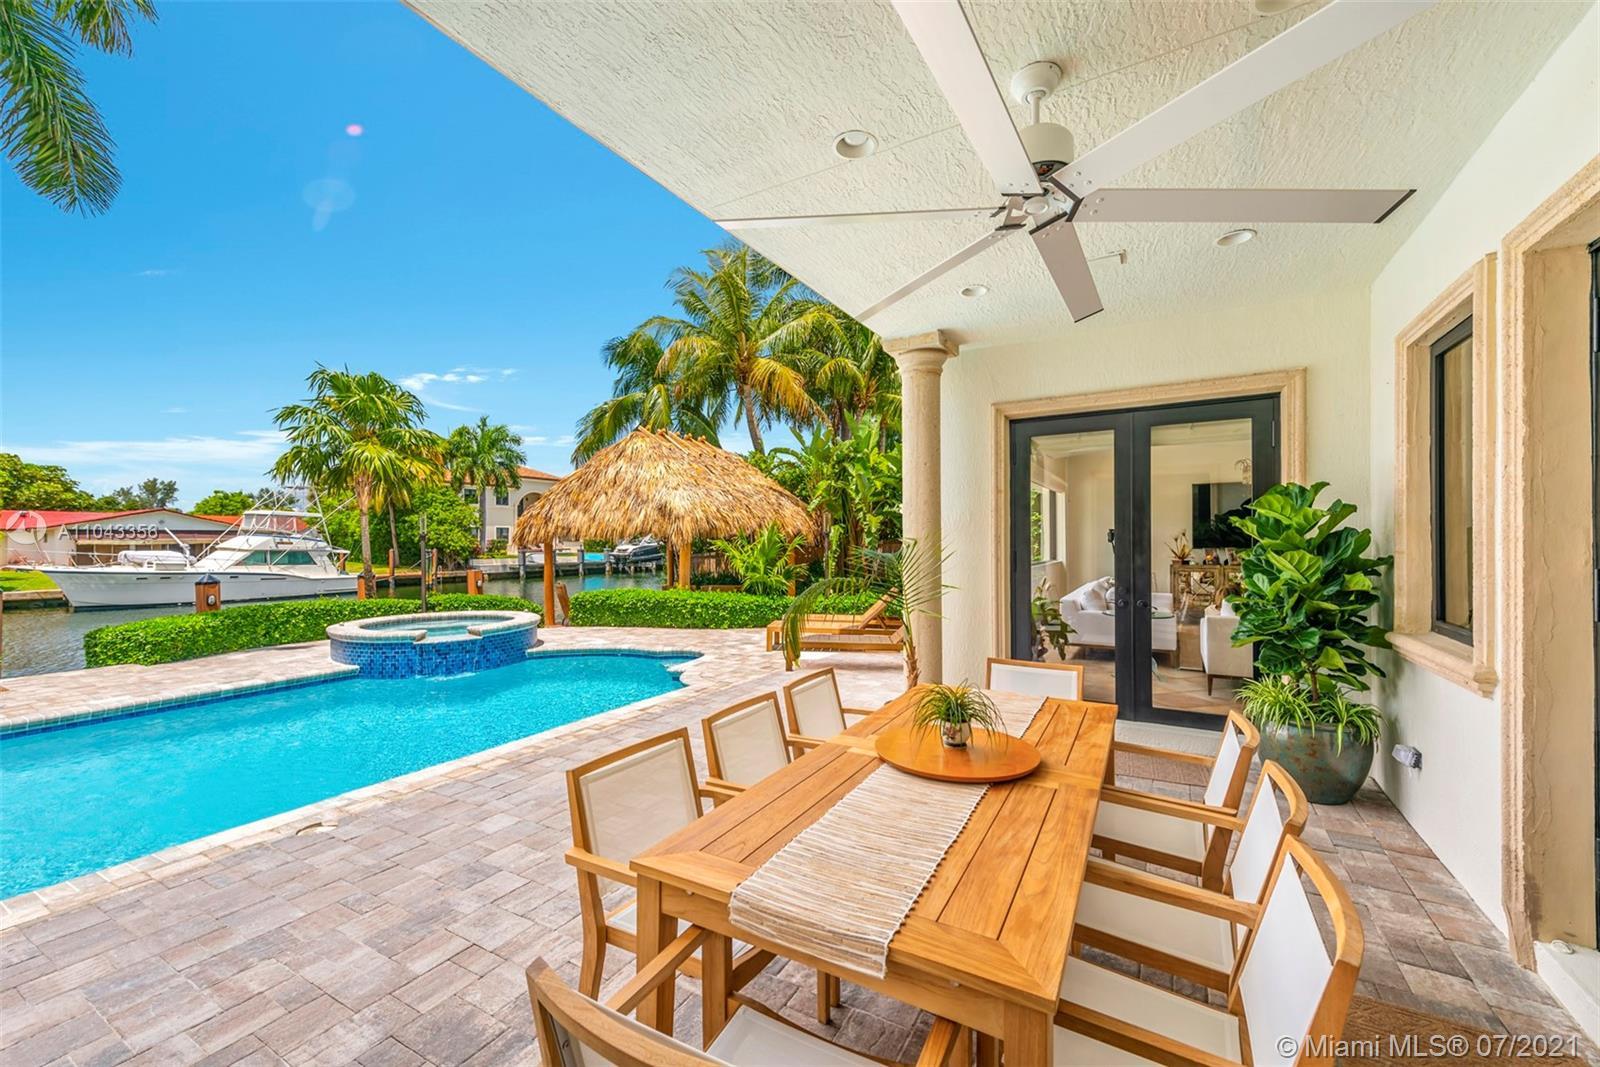 Golden Isles - 636 PALM DRIVE, Hallandale Beach, FL 33009